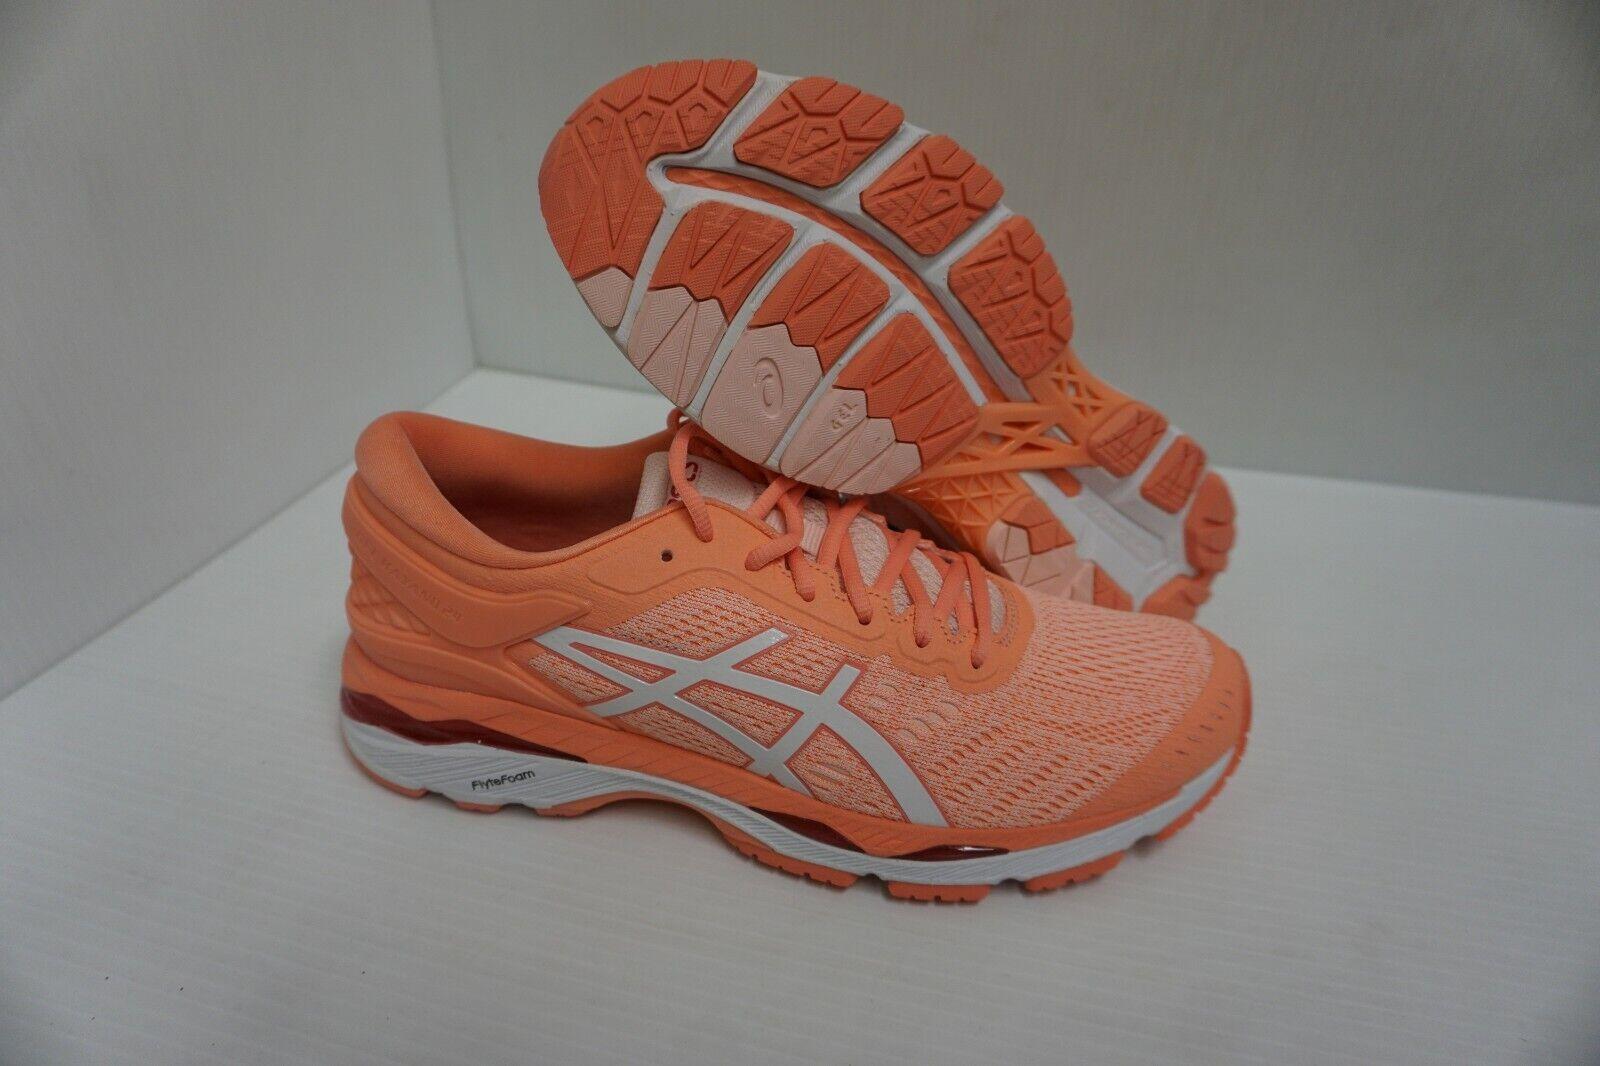 Asics Damen Schuhe Gel Kayano 24 Seashell Rosa Größe 10.5 US